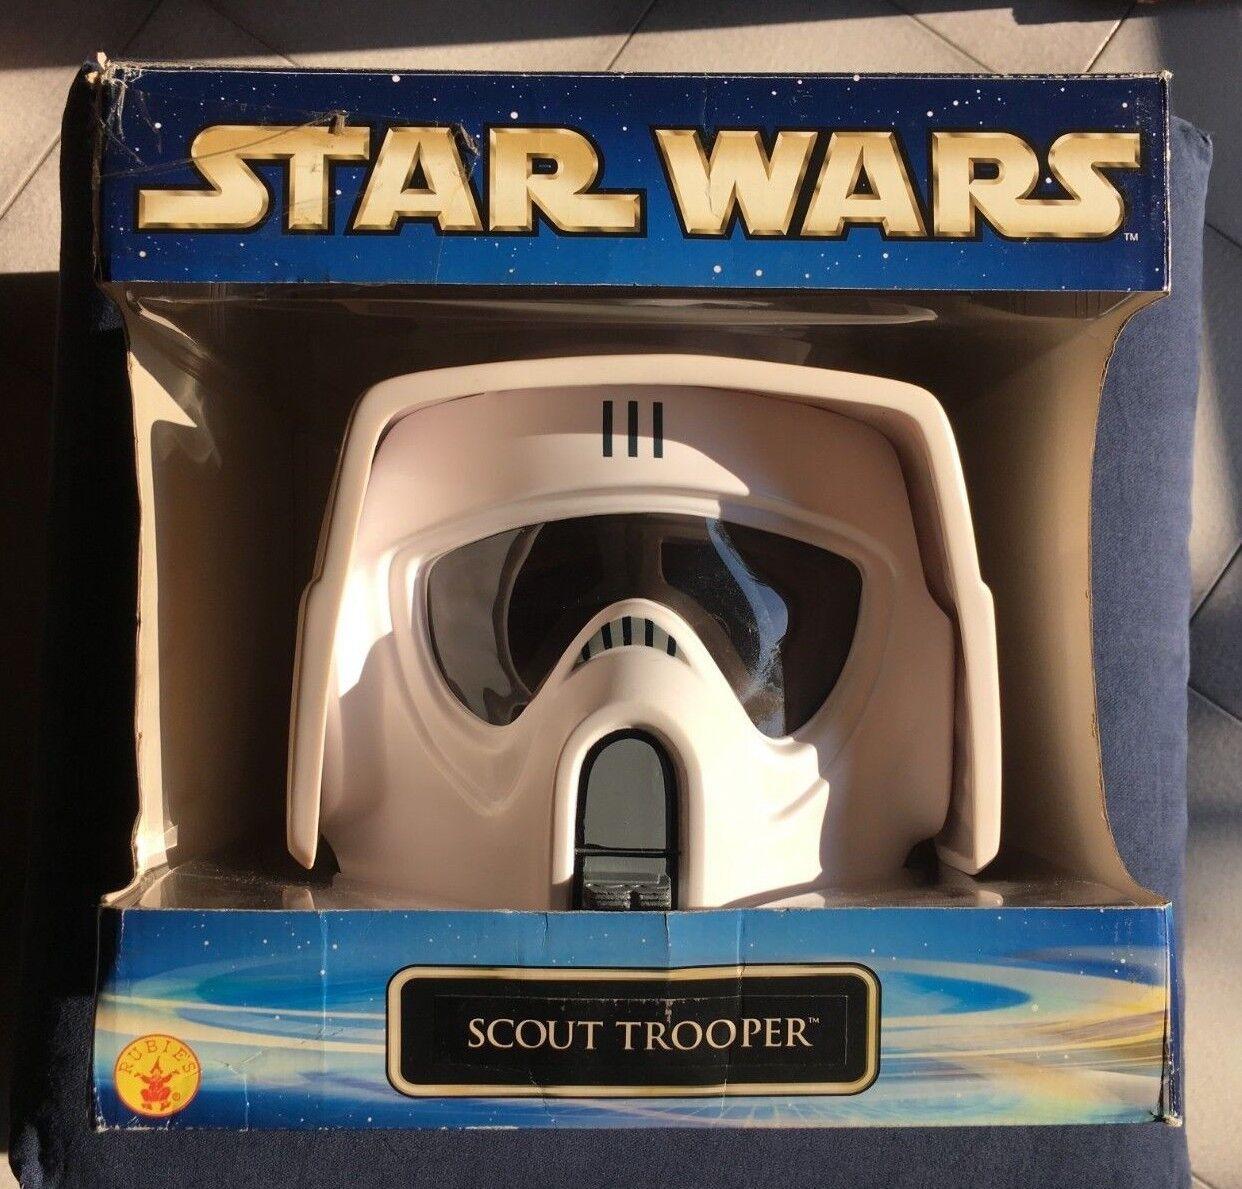 SCOUT TROOPER casco Rubies 2002 Guerre Stellari Star Wars helmet maschera